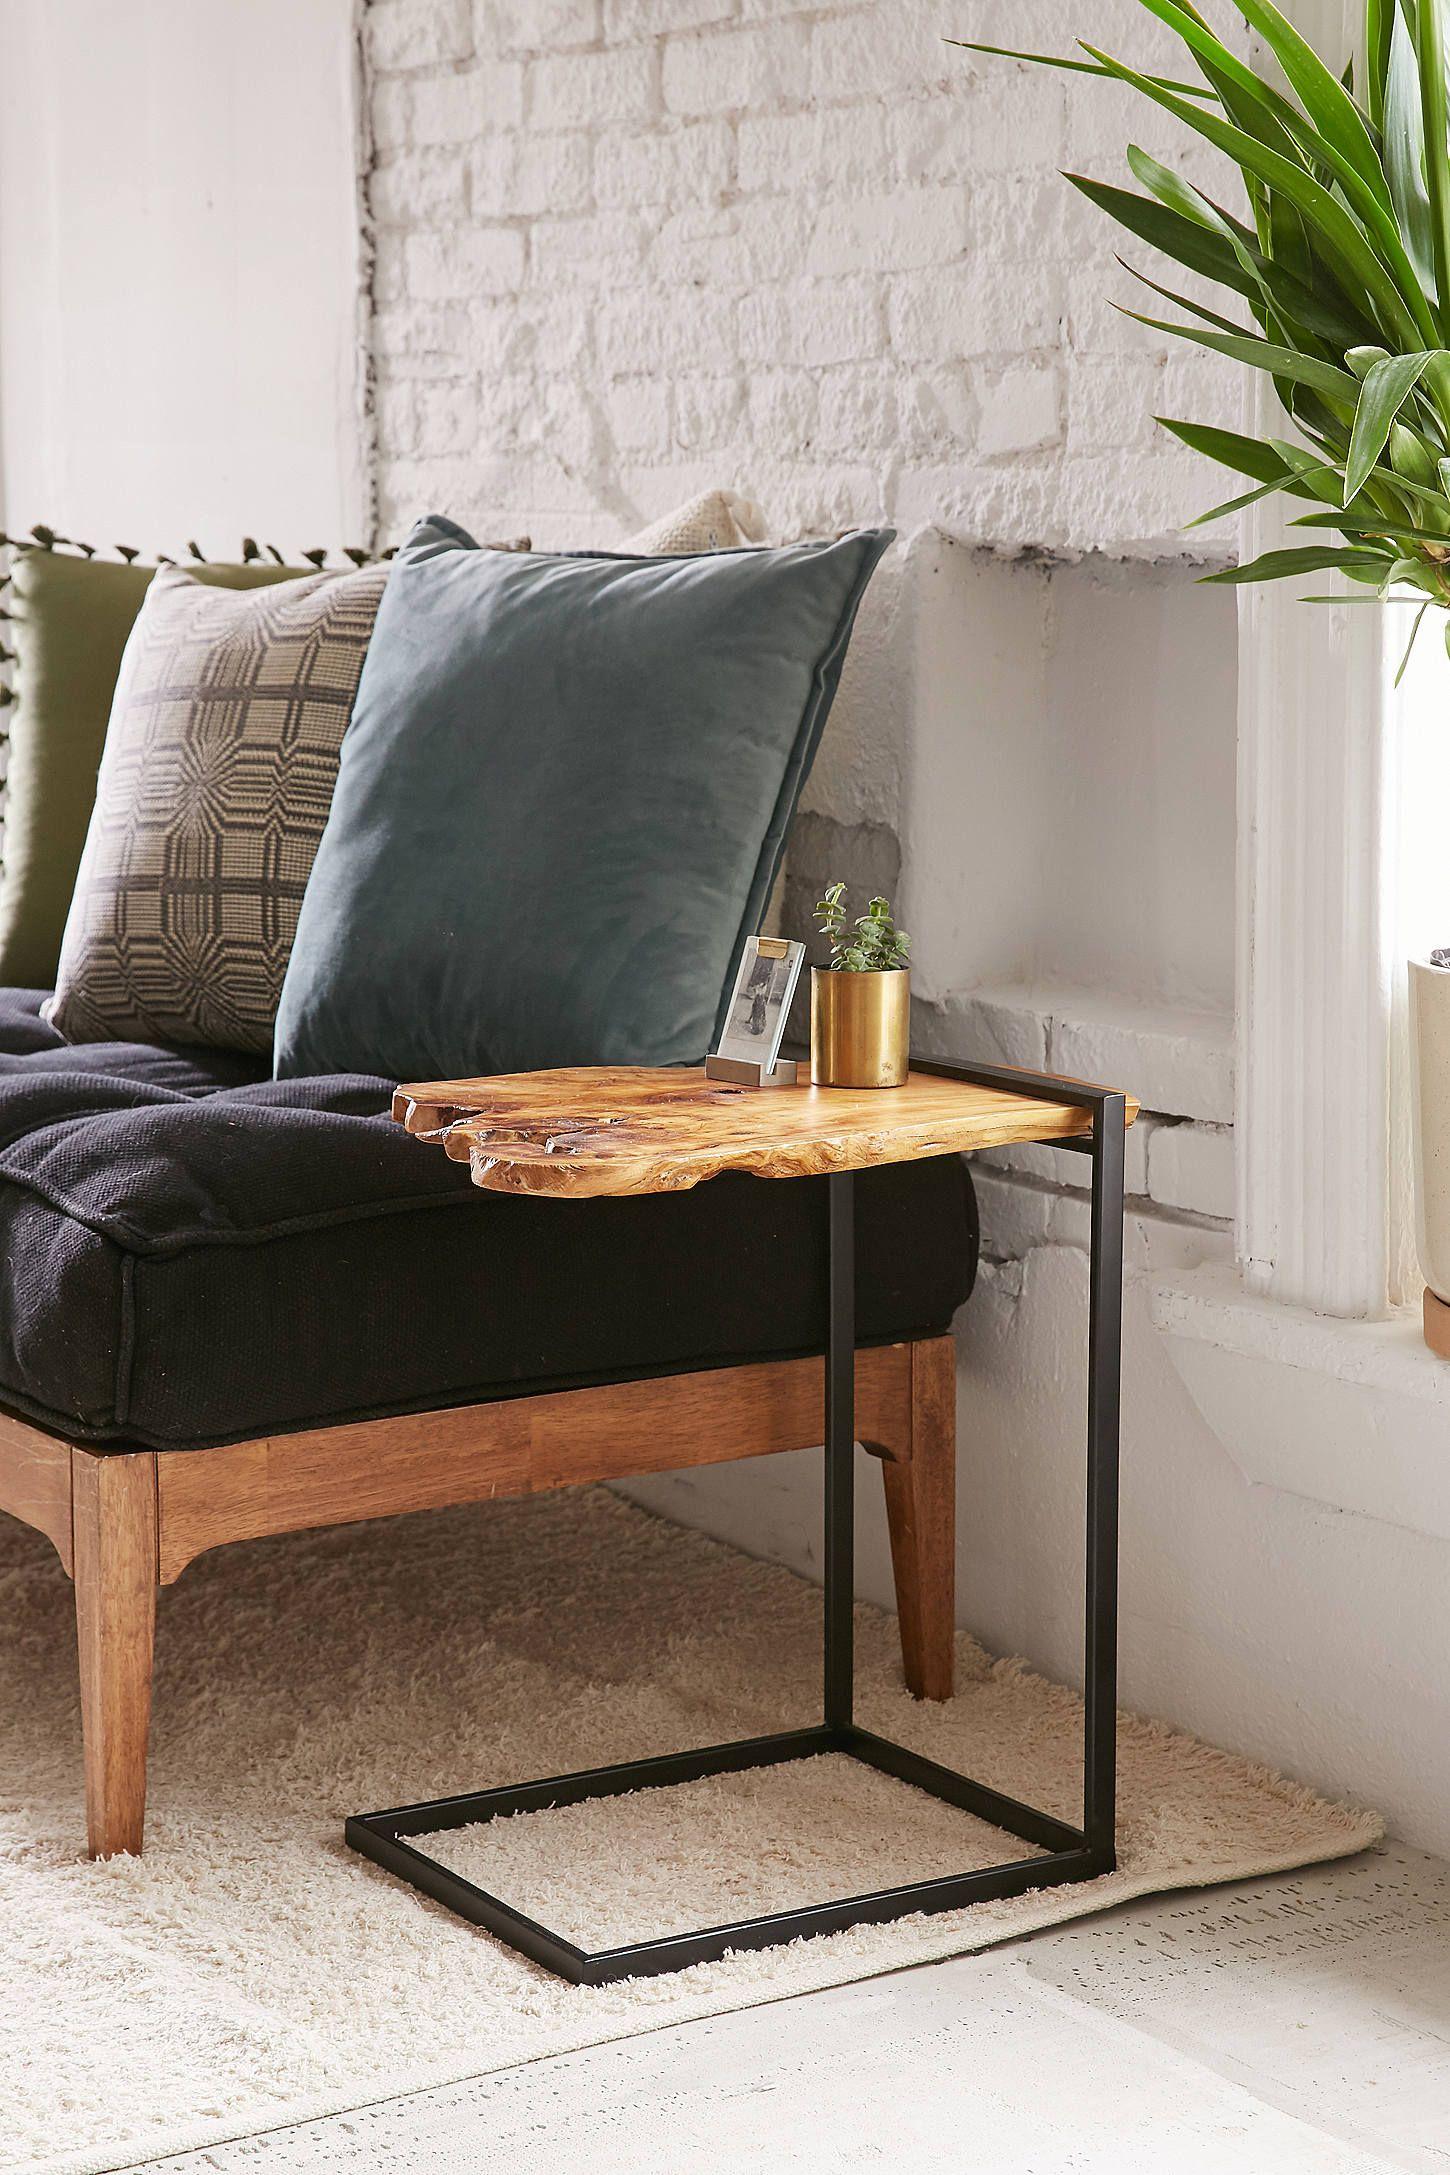 Woodrow Live Edge Wood Side Table Side Table Wood Live Edge Wood Side Tables Living Room Side Table